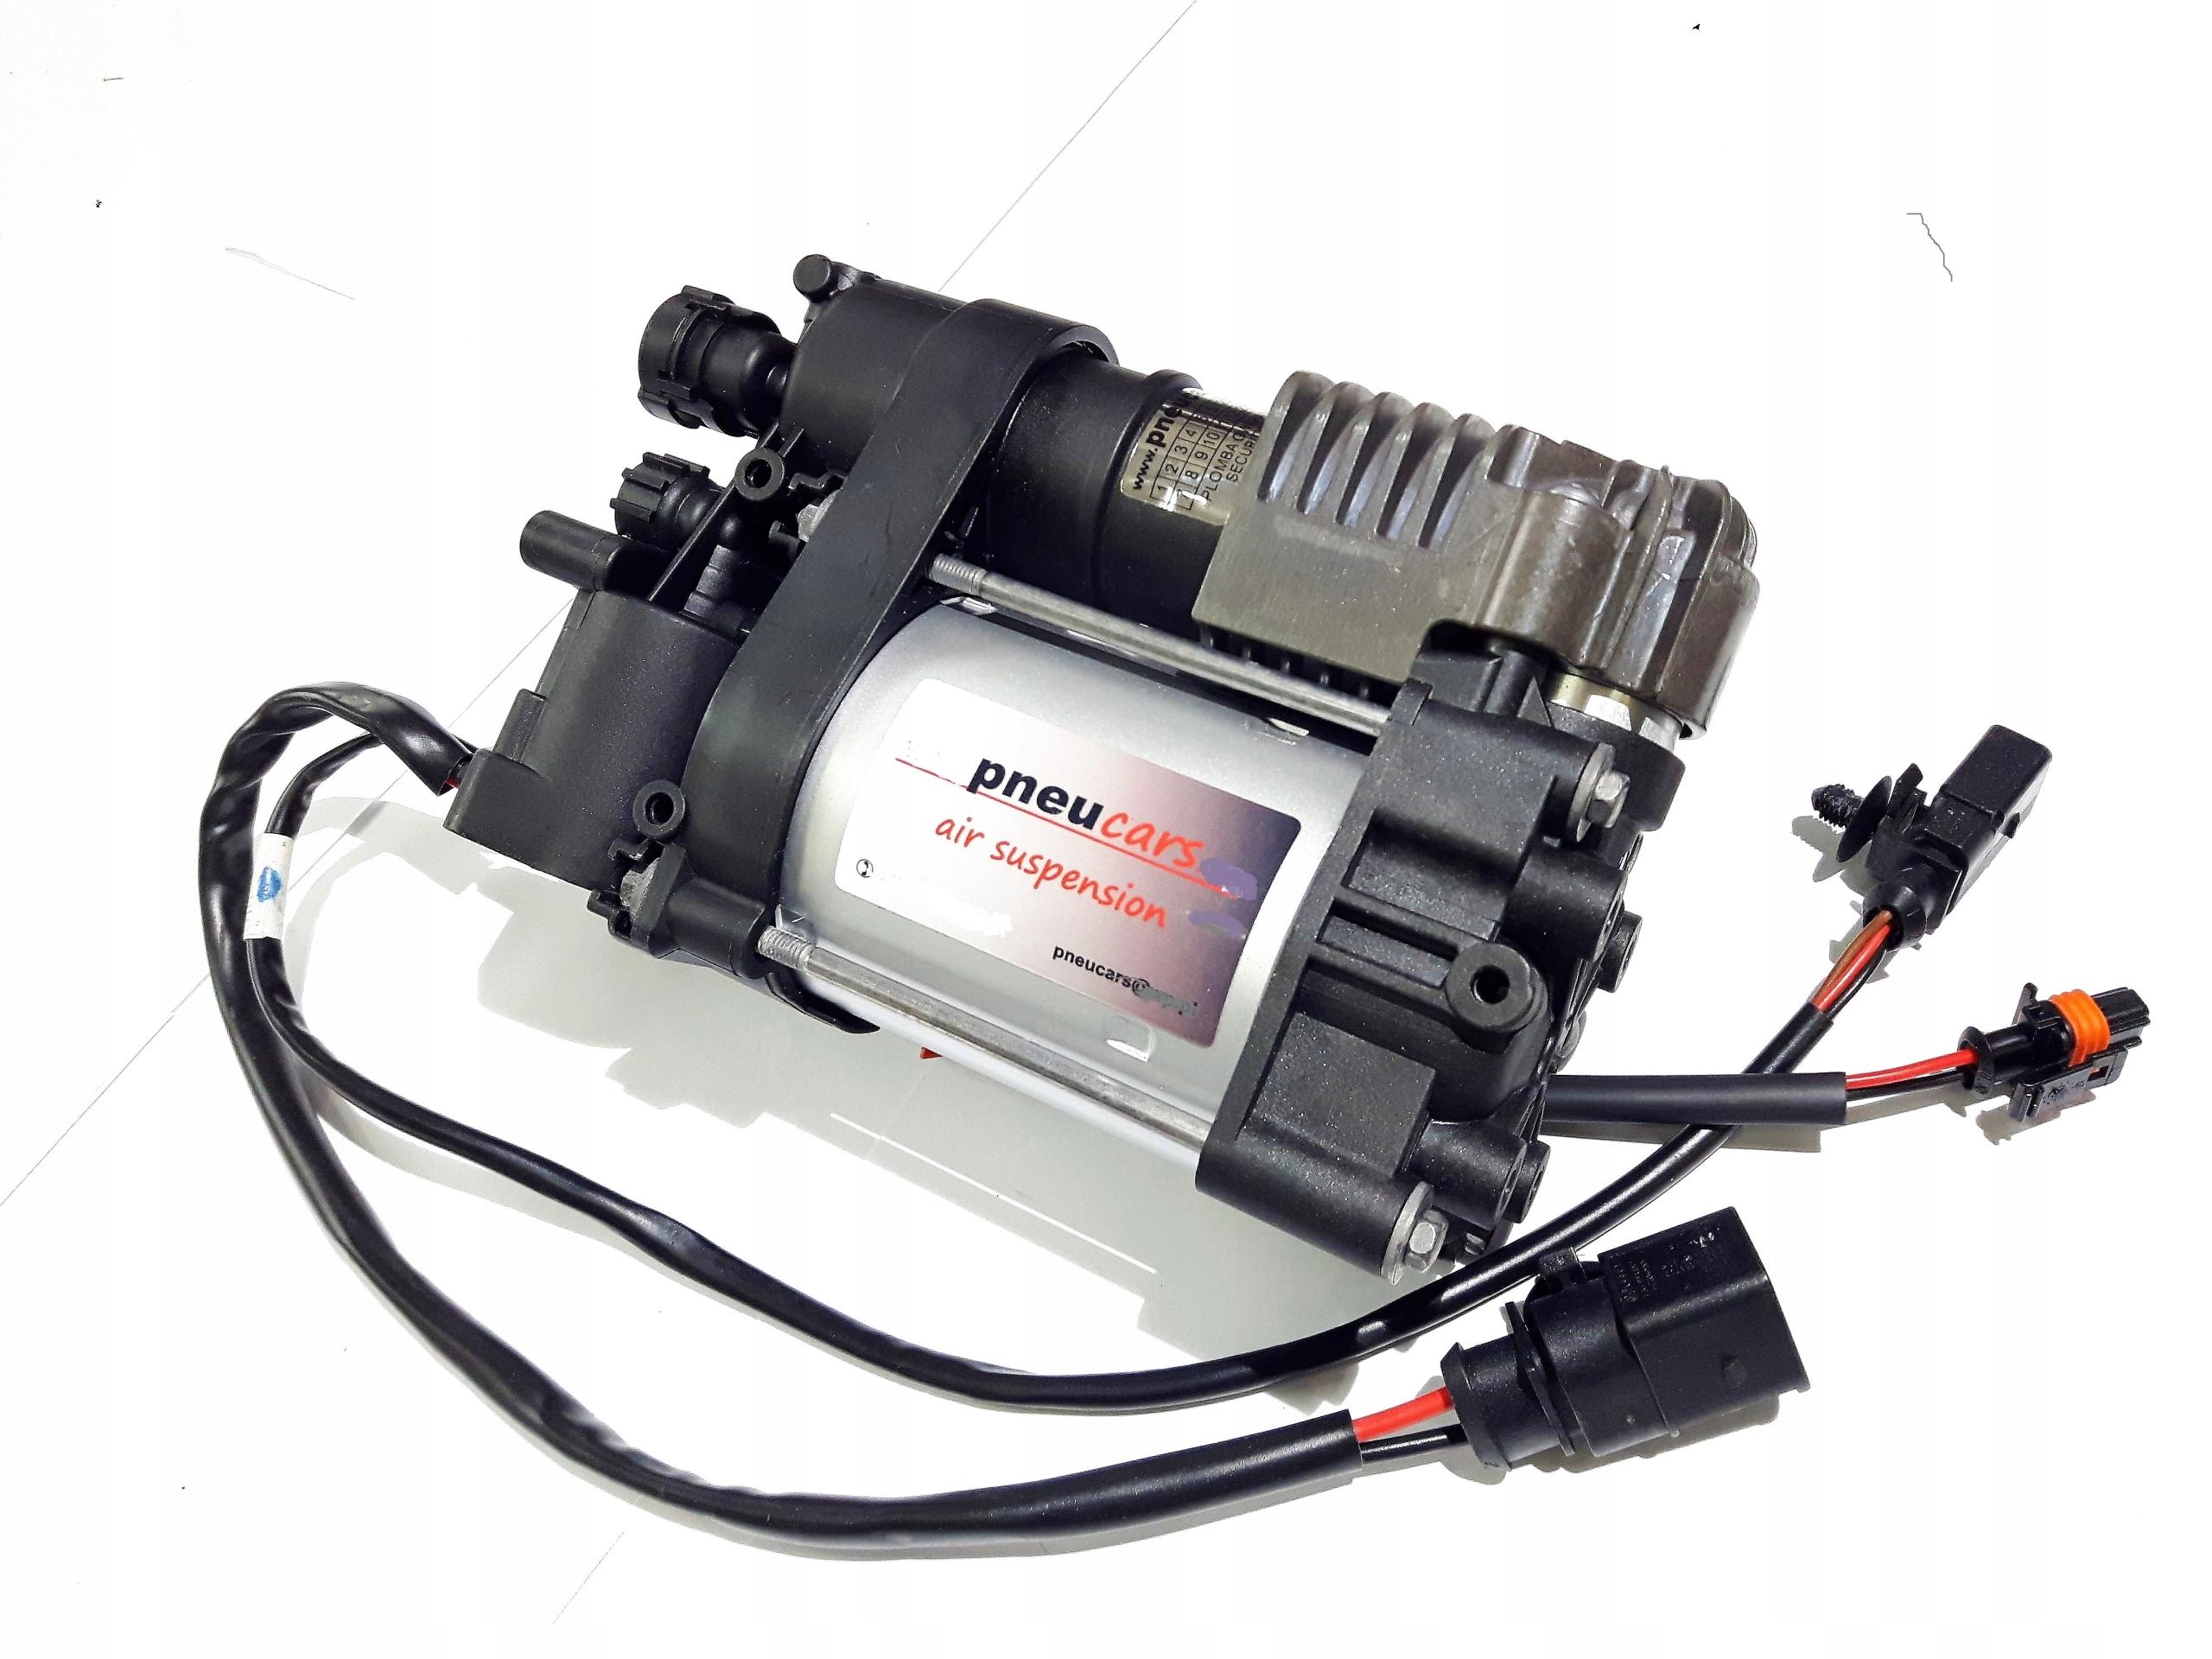 porsche panamera компрессор насос подвески